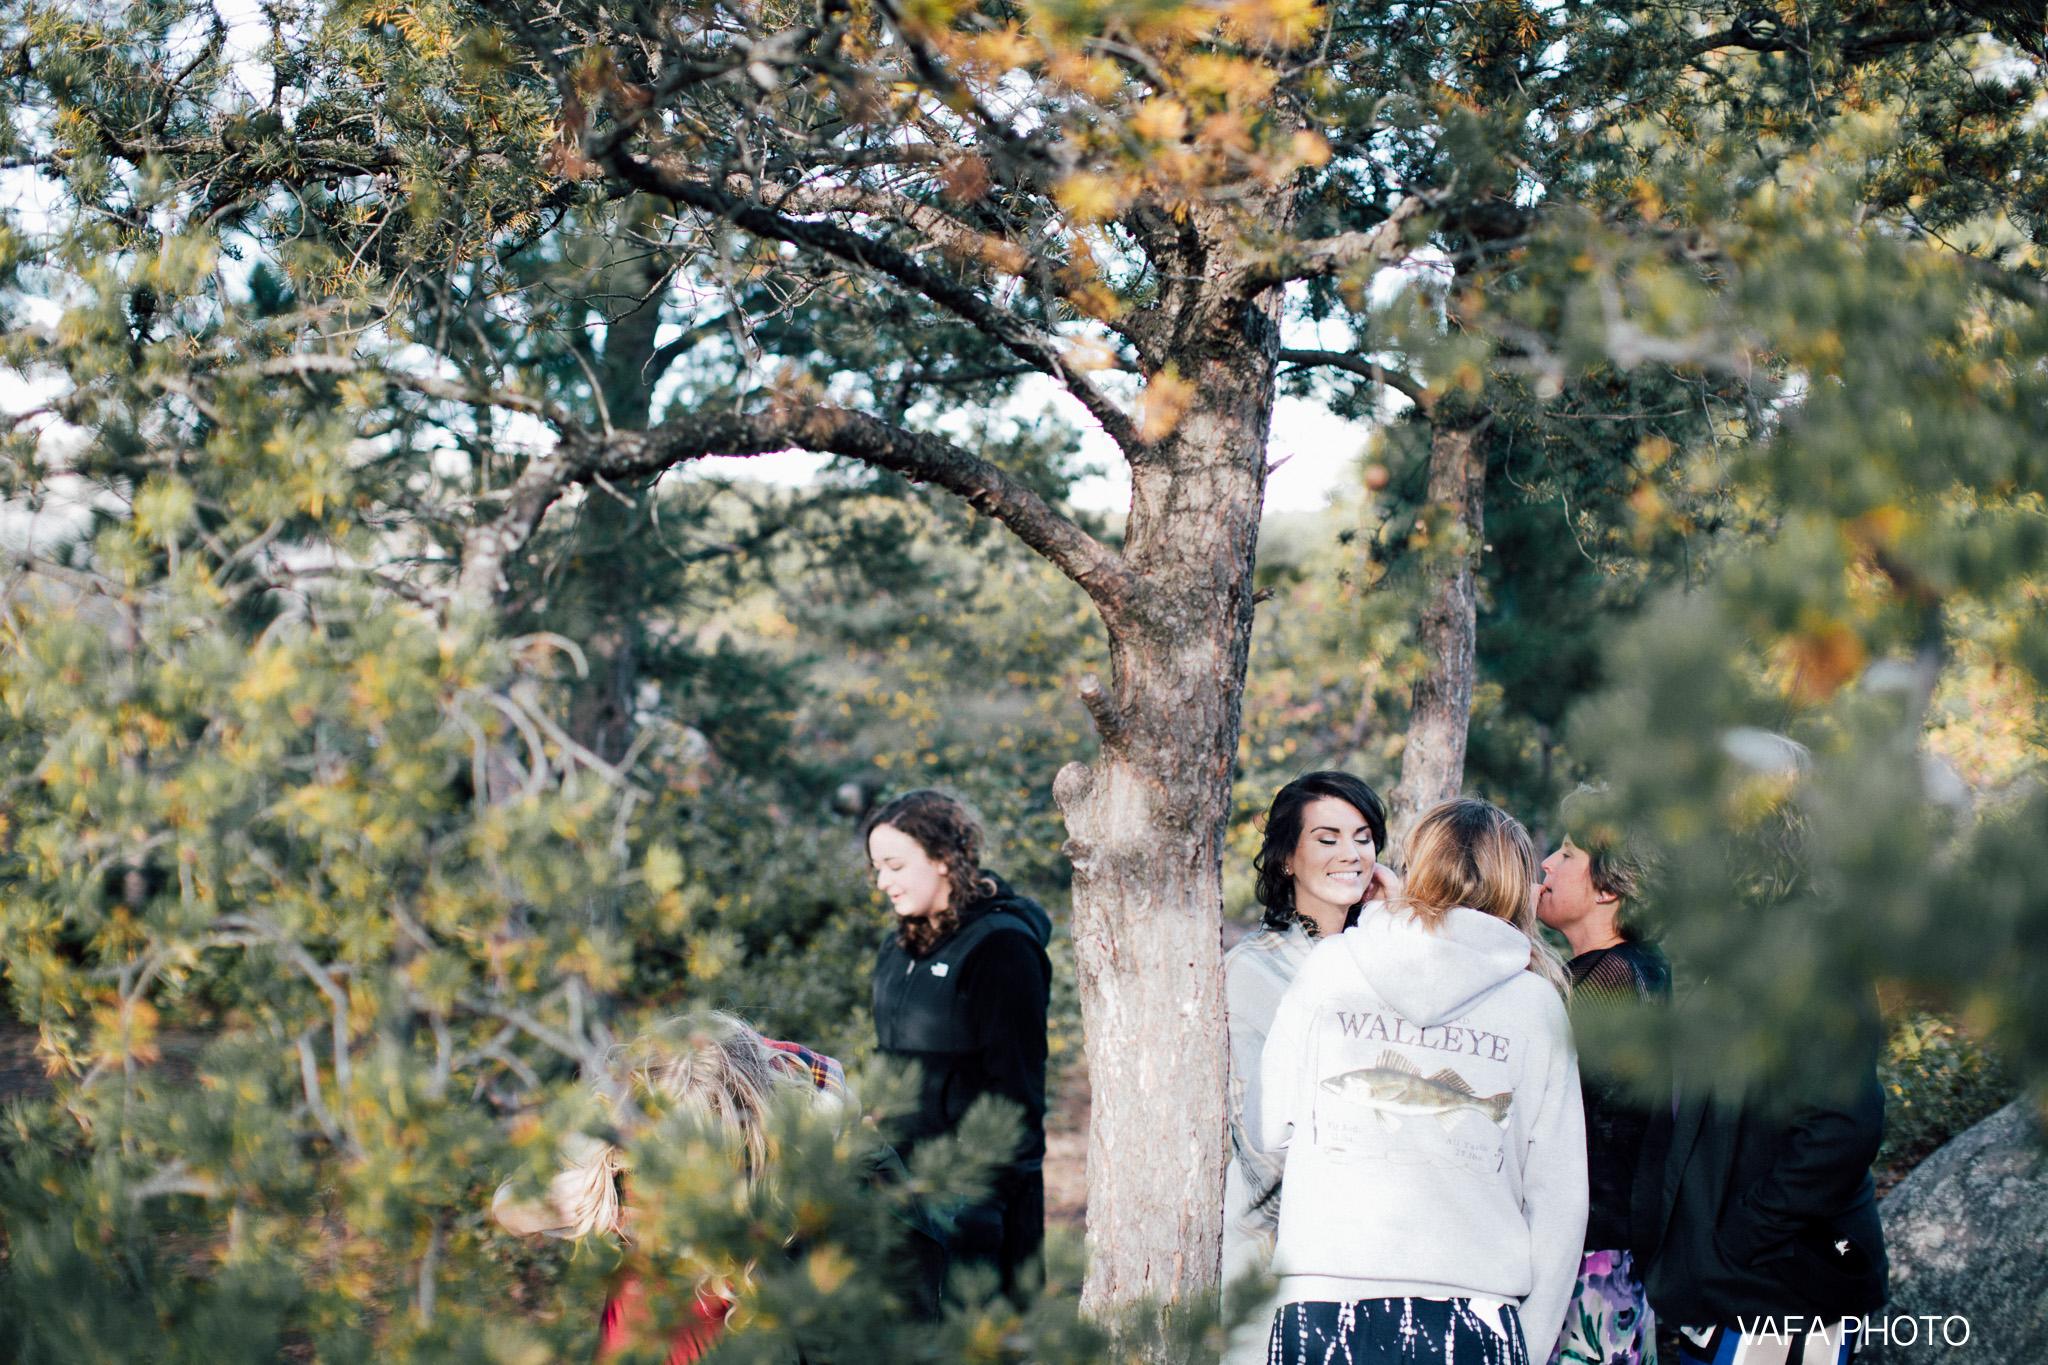 Hogback-Mountain-Wedding-Chelsea-Josh-Vafa-Photo-93.jpg